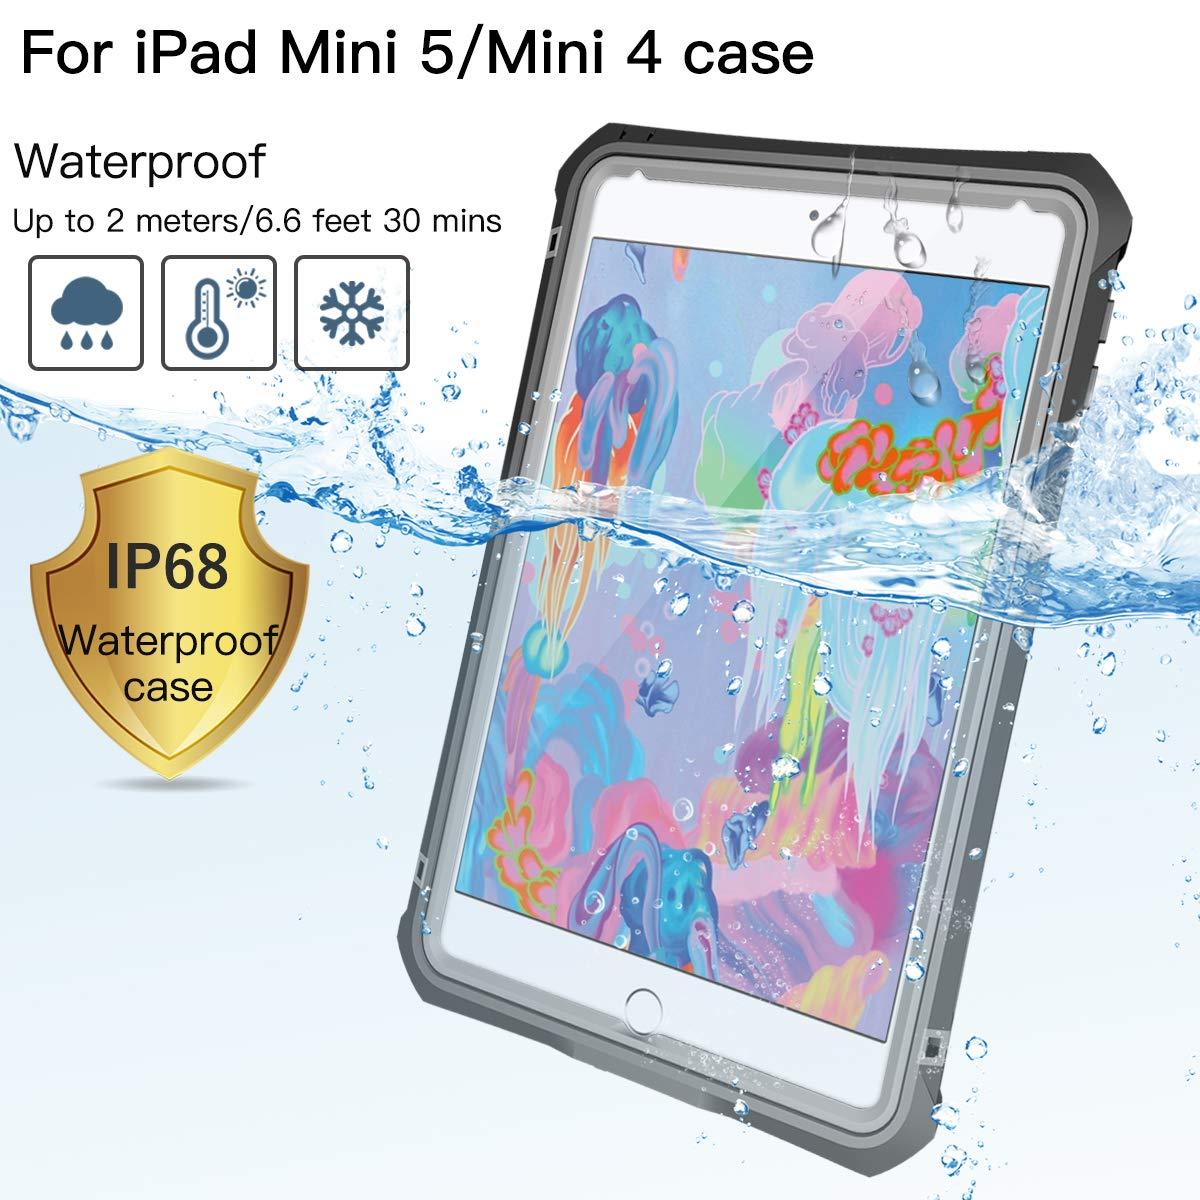 iPad Mini 5 Case MOMOTS iPad Mini 5 IP 68 Level FullBody Protective with Builtin Screen Protector